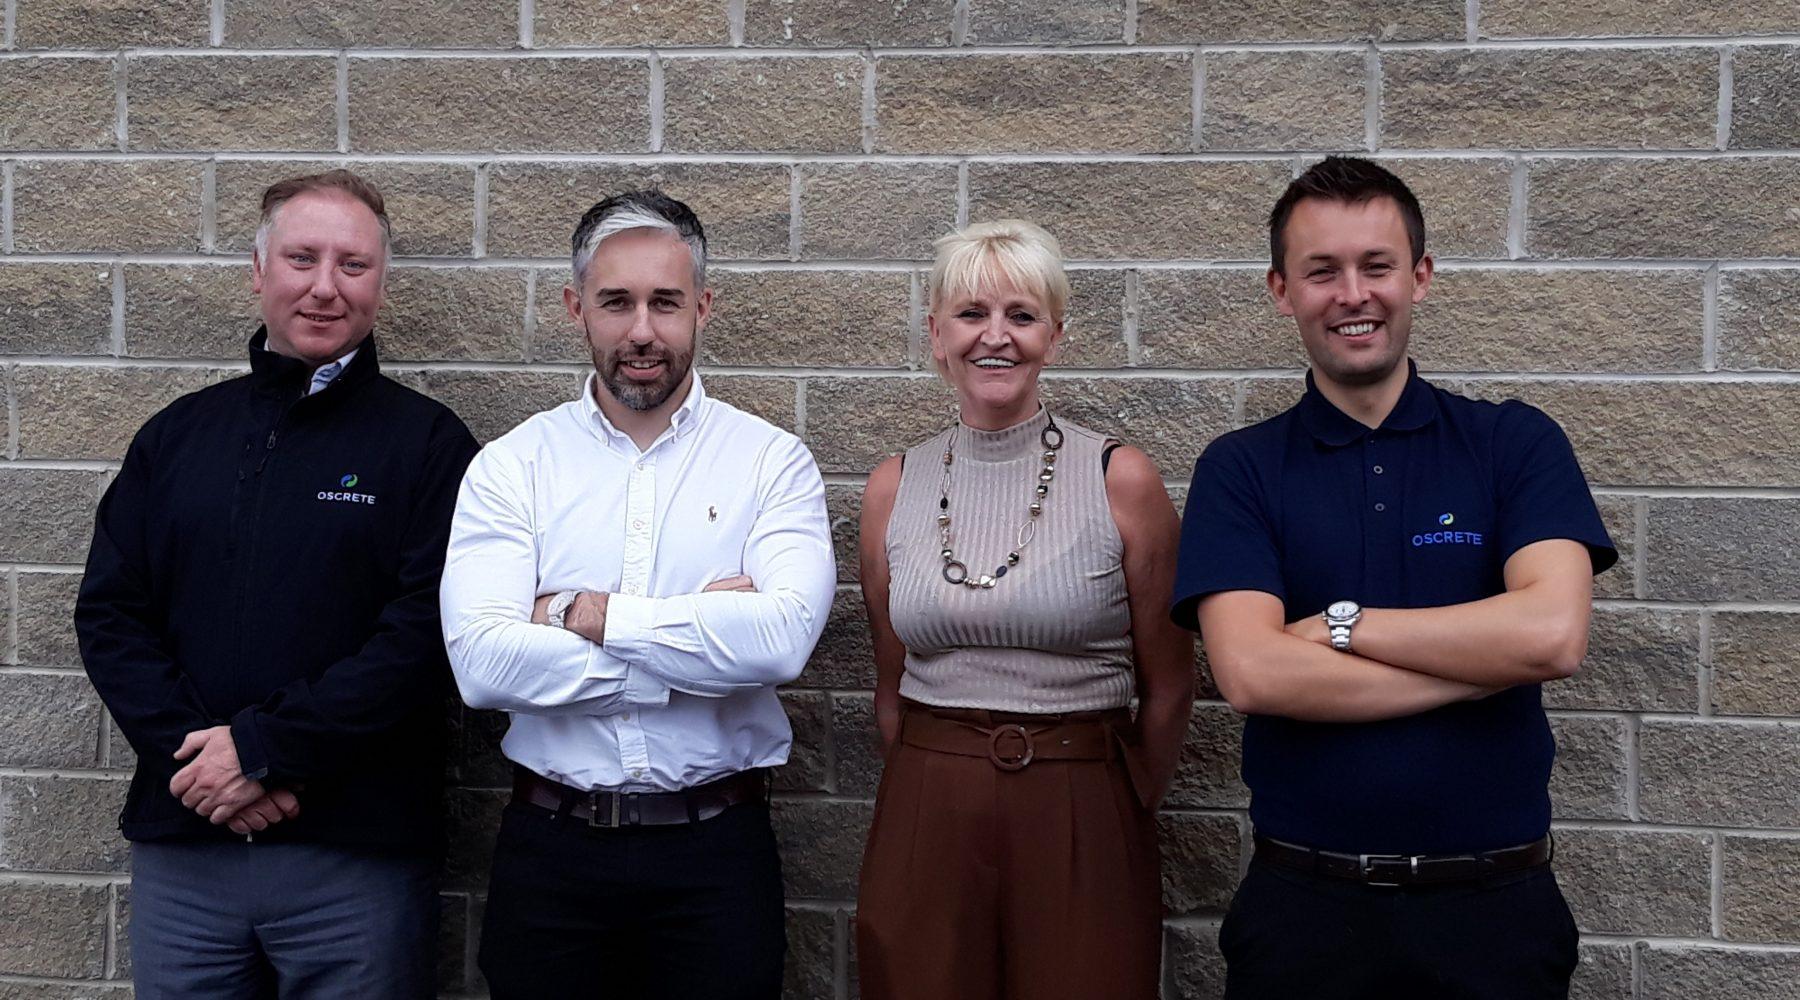 Oscrete sales team celebrate qualifications success